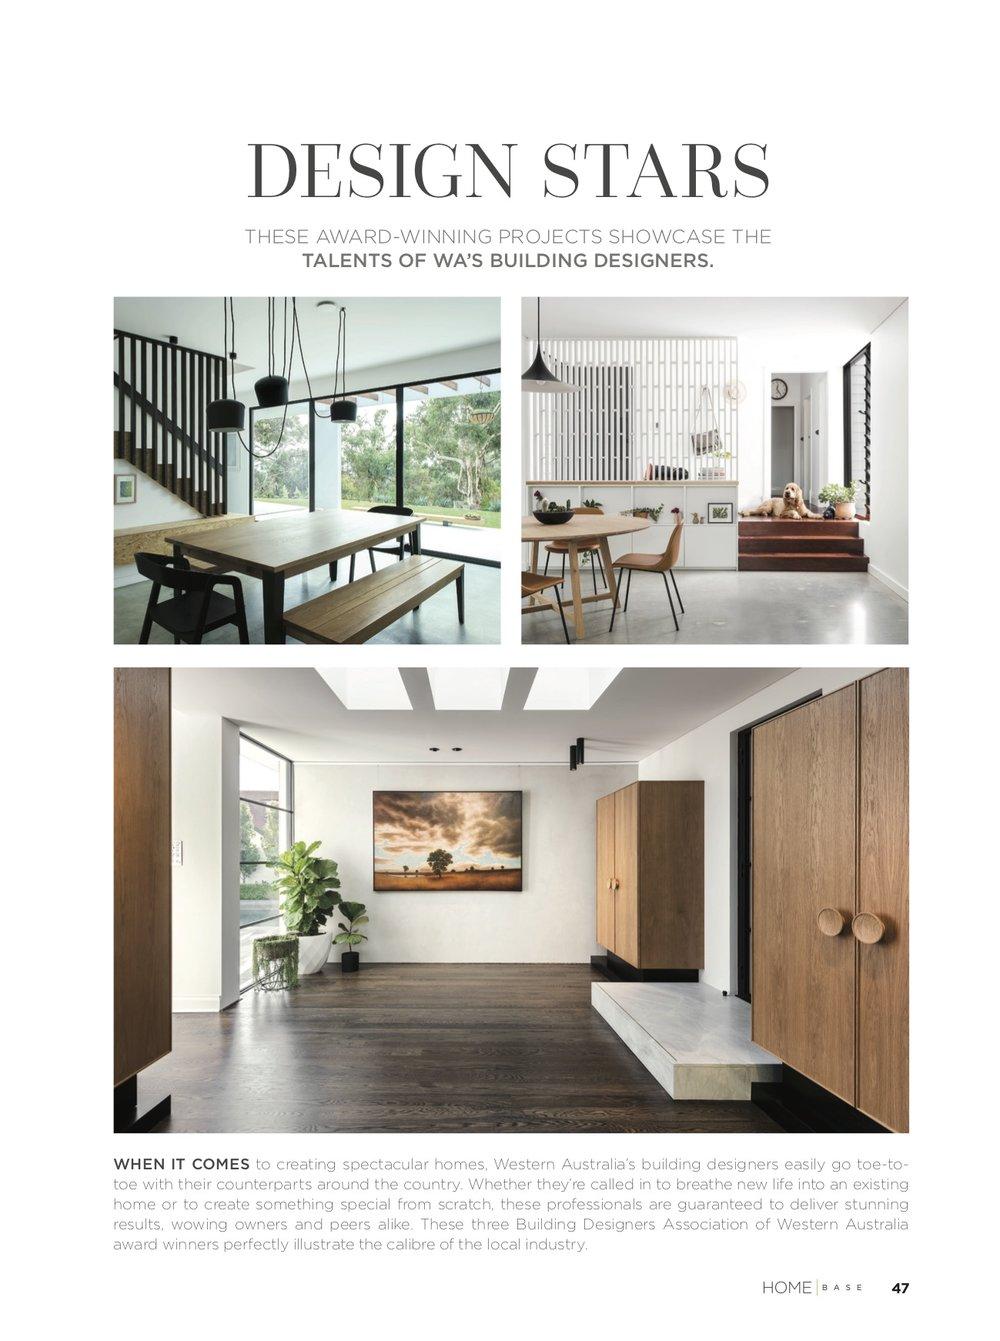 5c3c10660817335c2d653e5b_05 Design Stars Homes pp46-61 (dragged).jpg